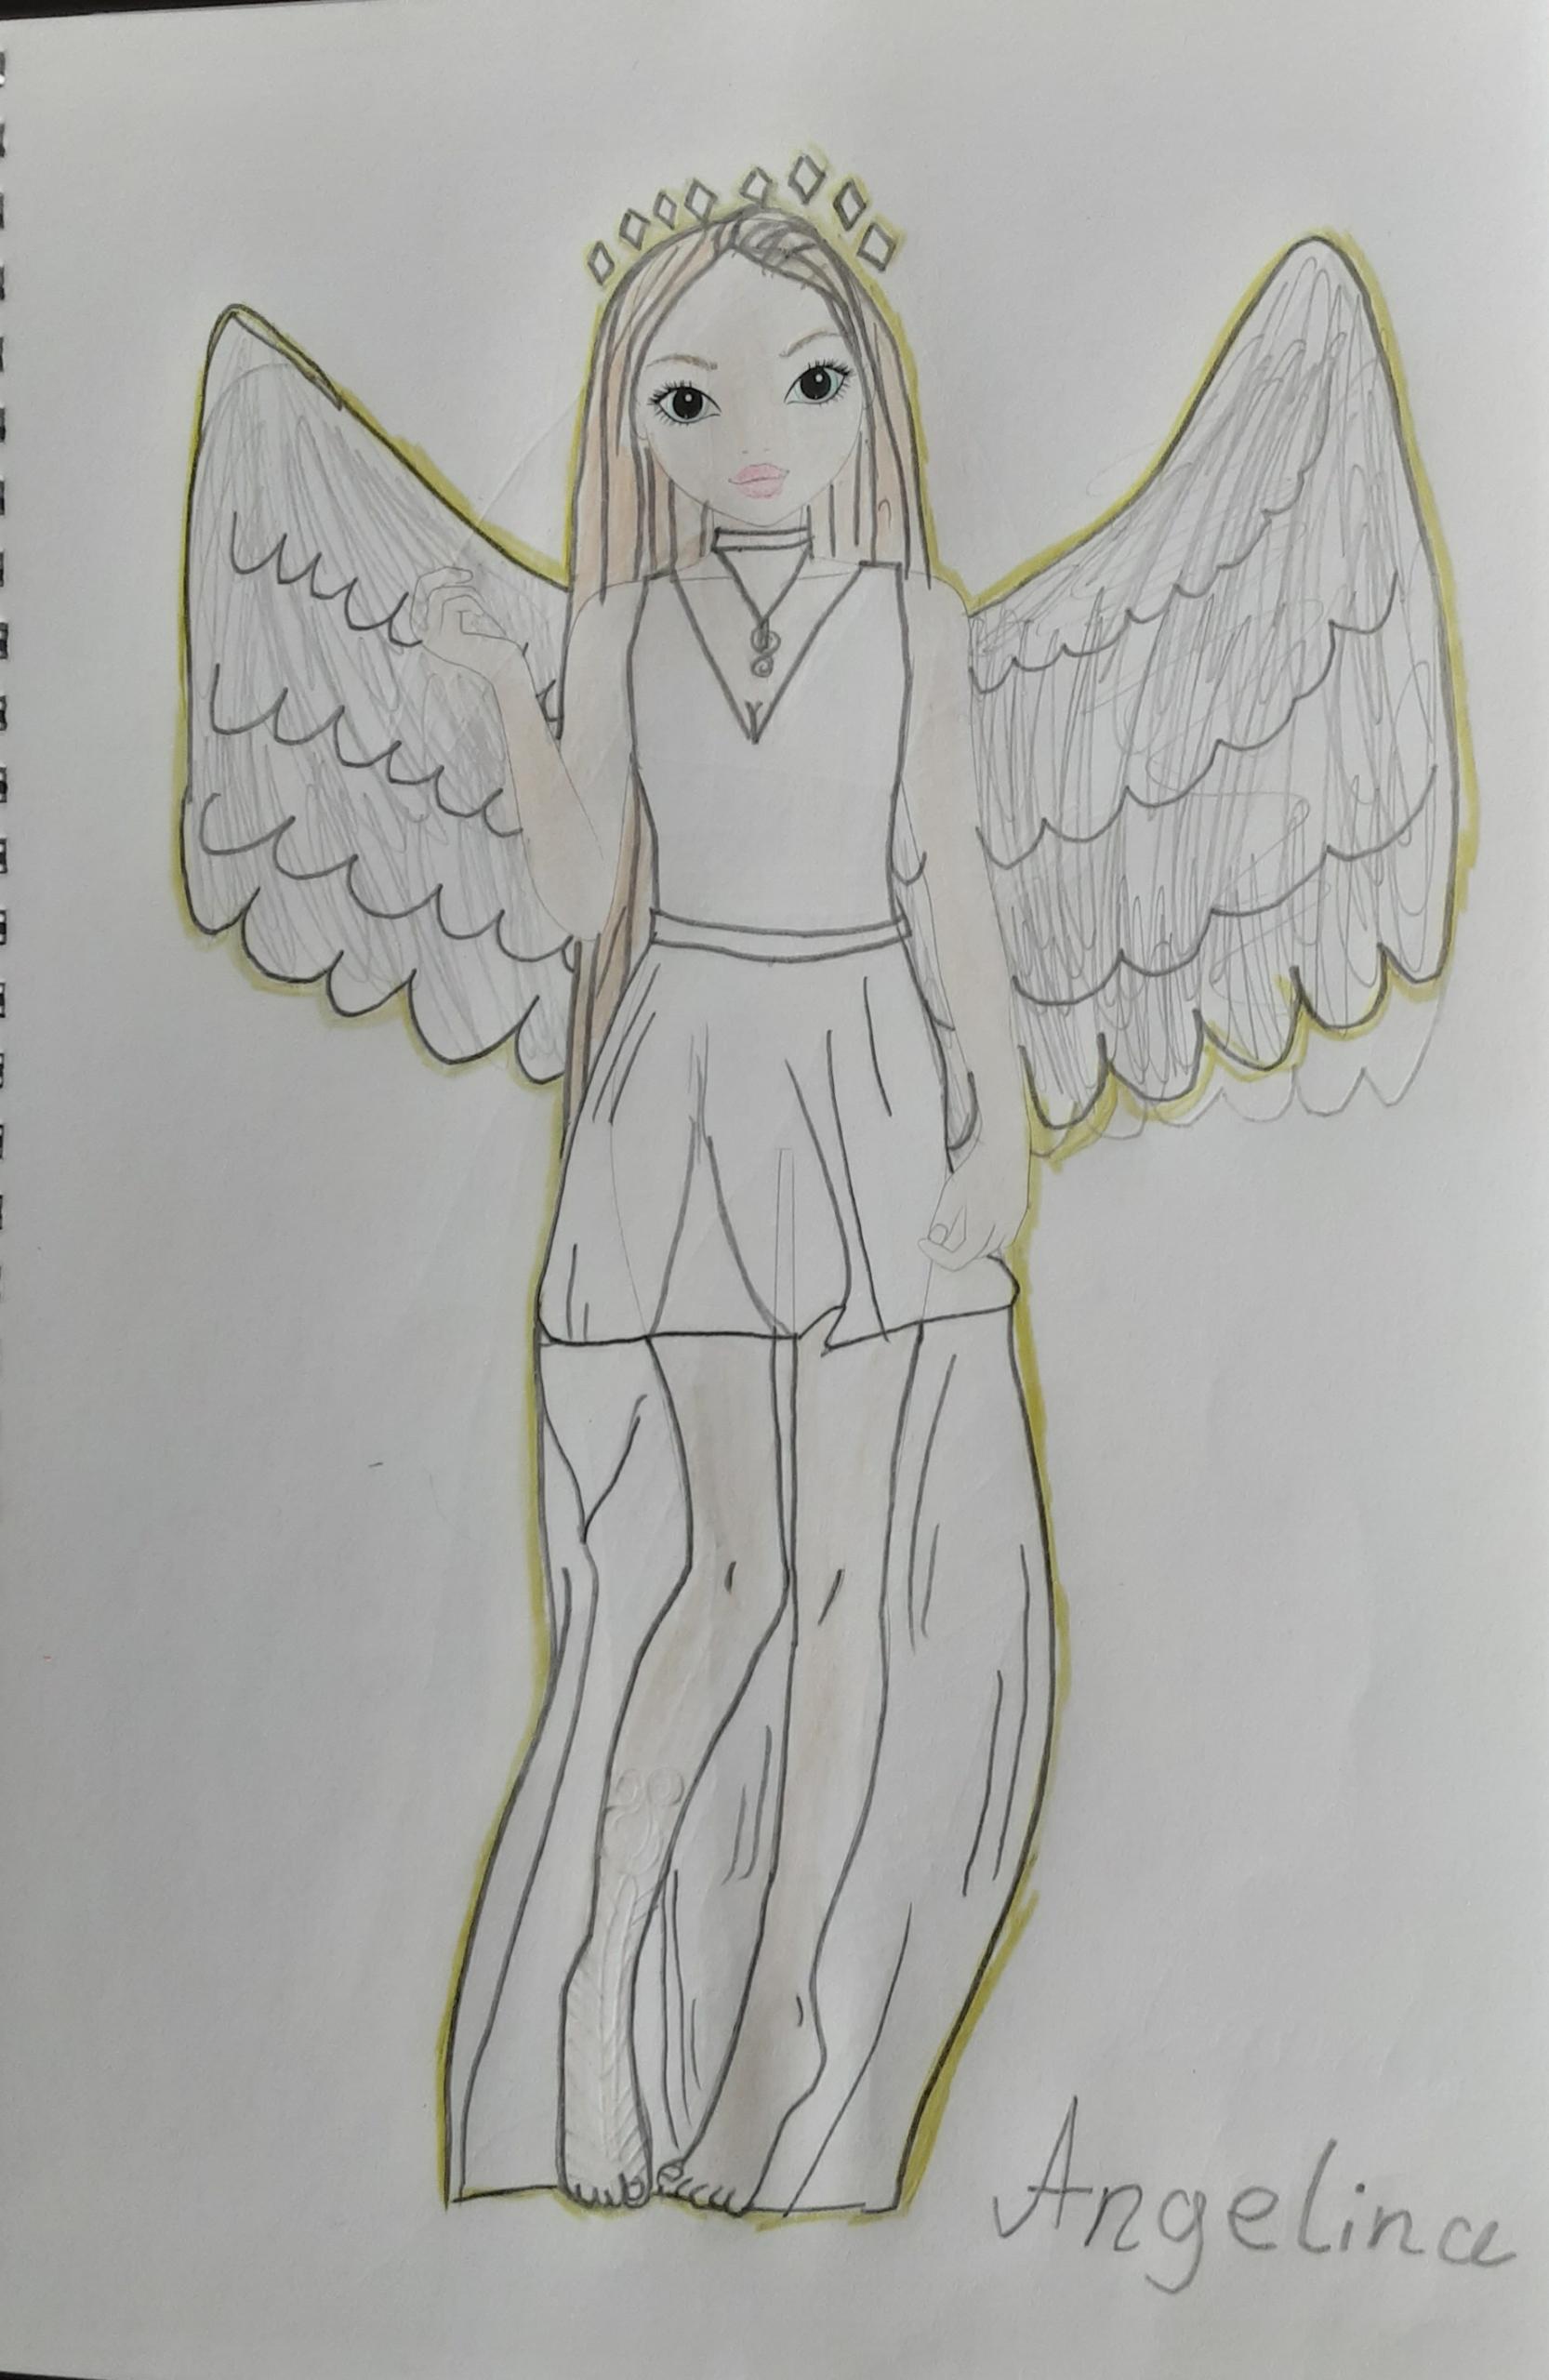 Darja  K., 9 Jahre, aus Köln